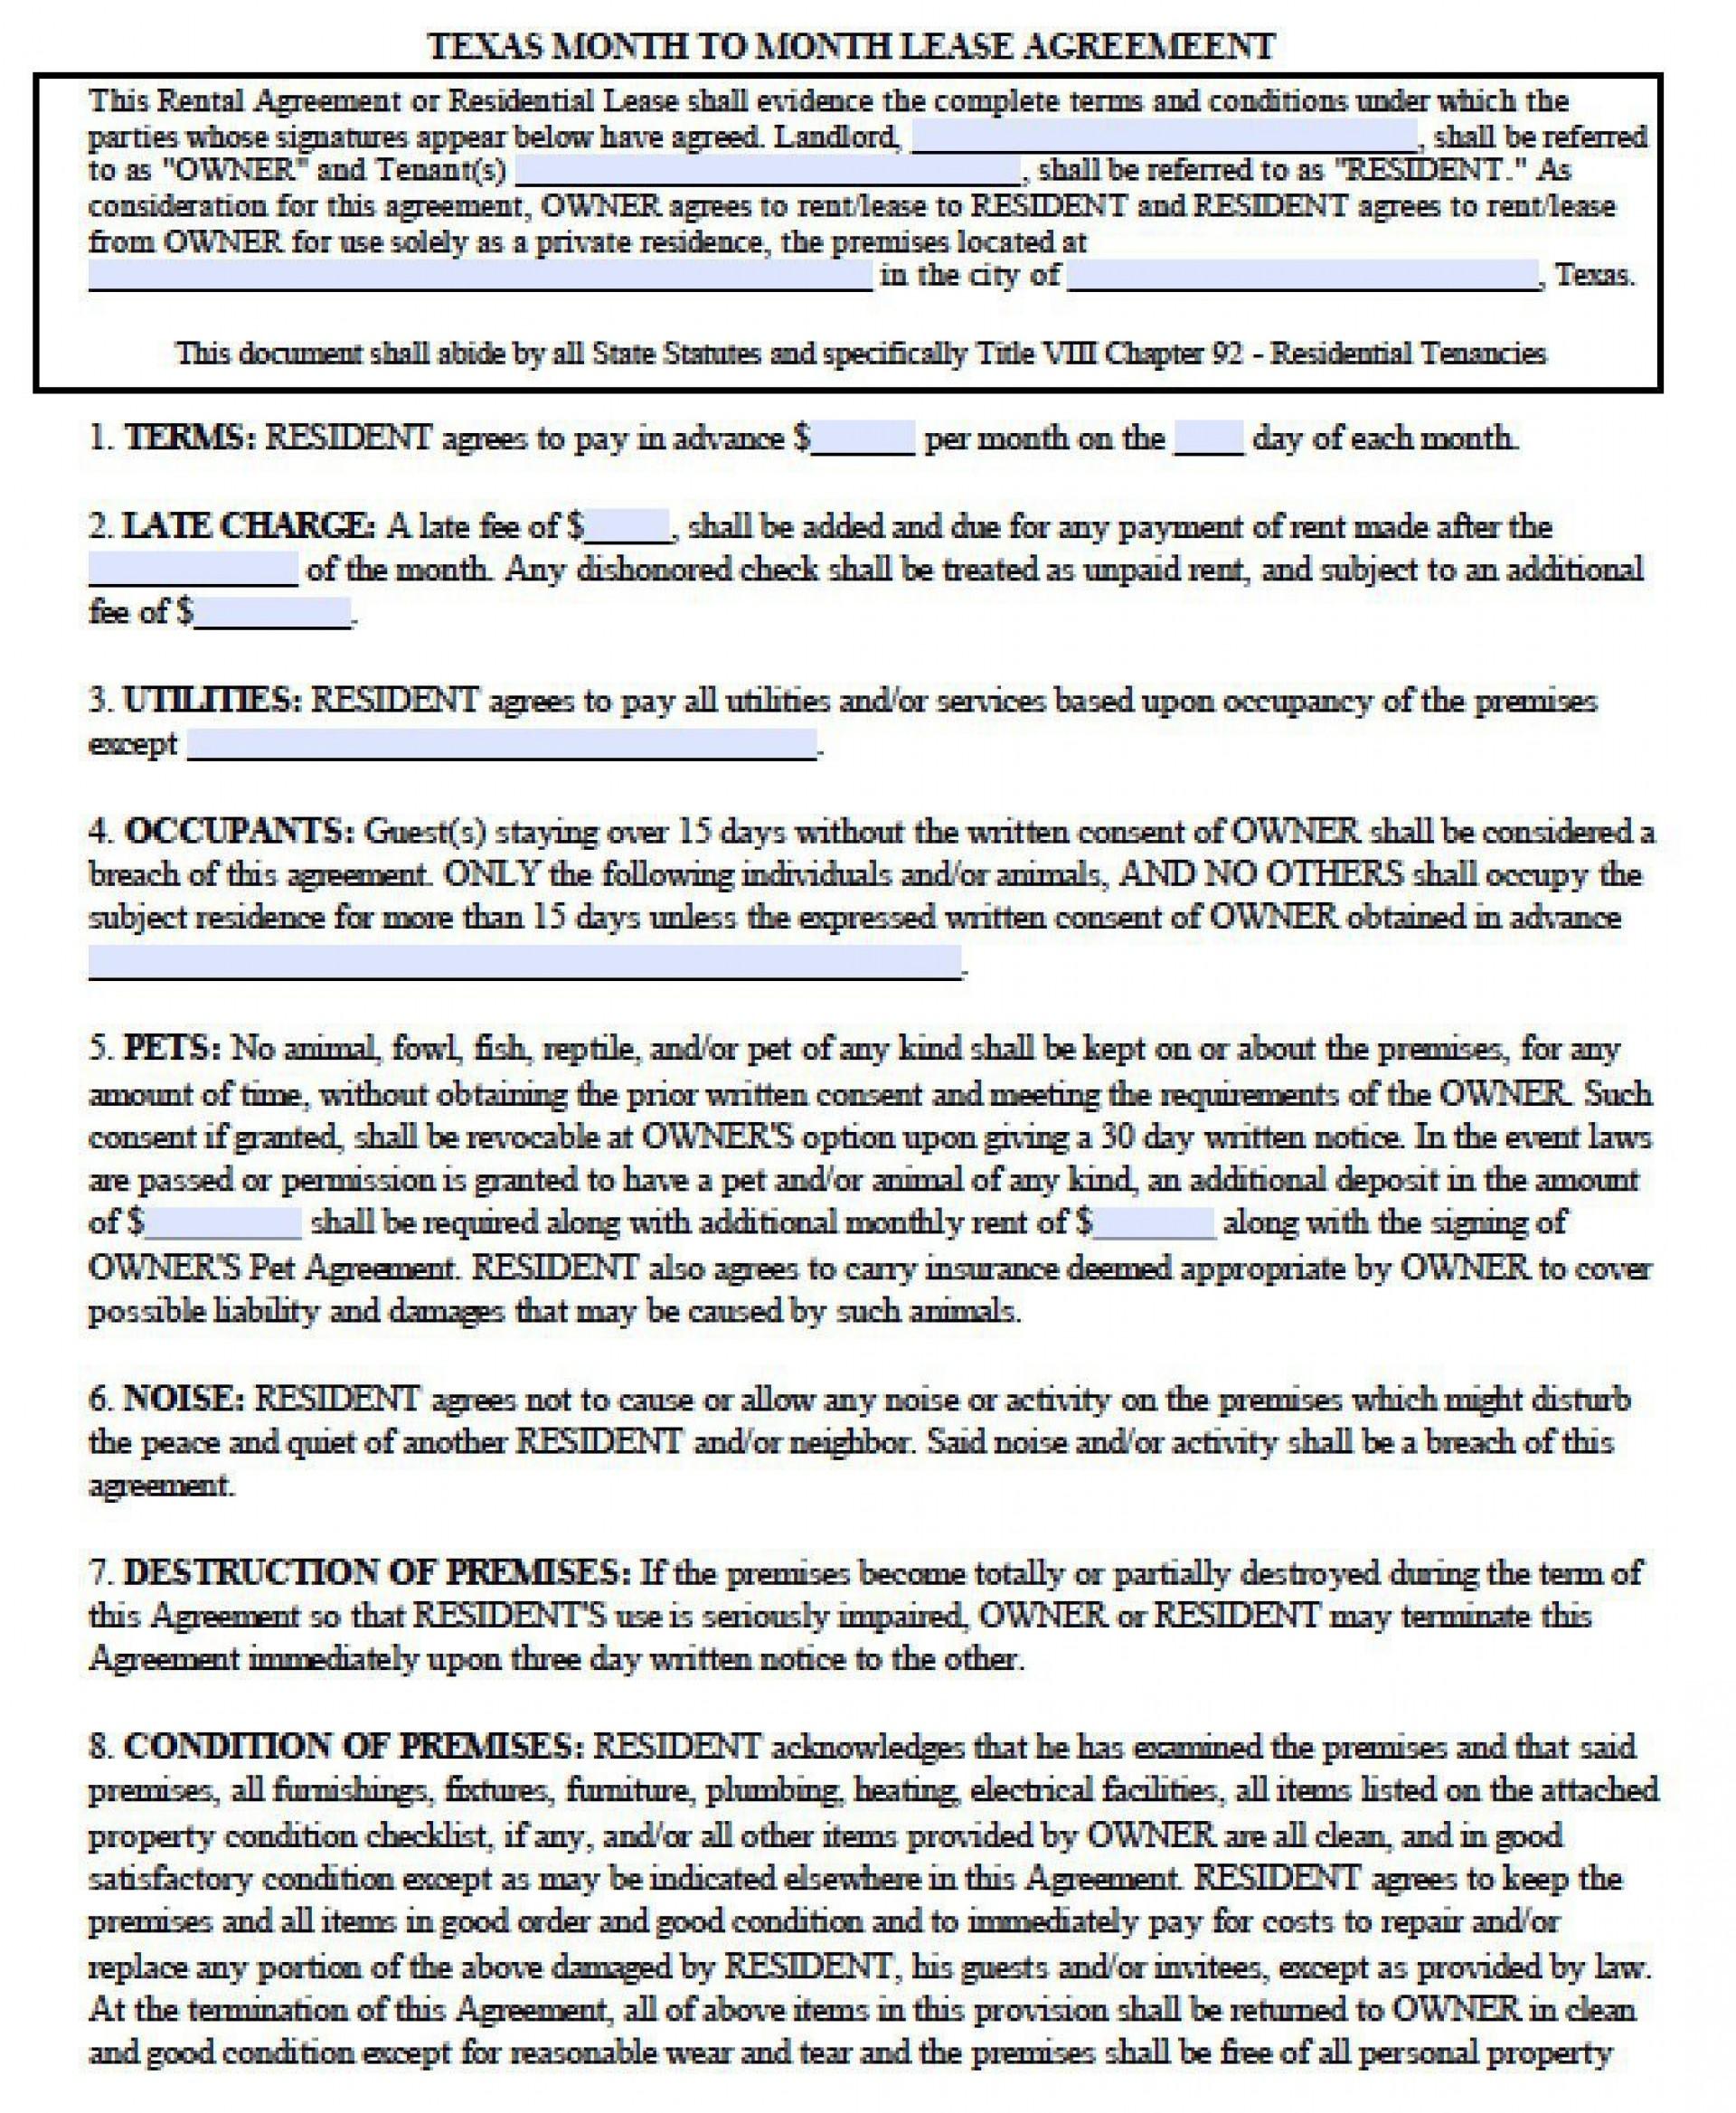 005 Dreaded Apartment Lease Agreement Form Texa Highest Quality 1920